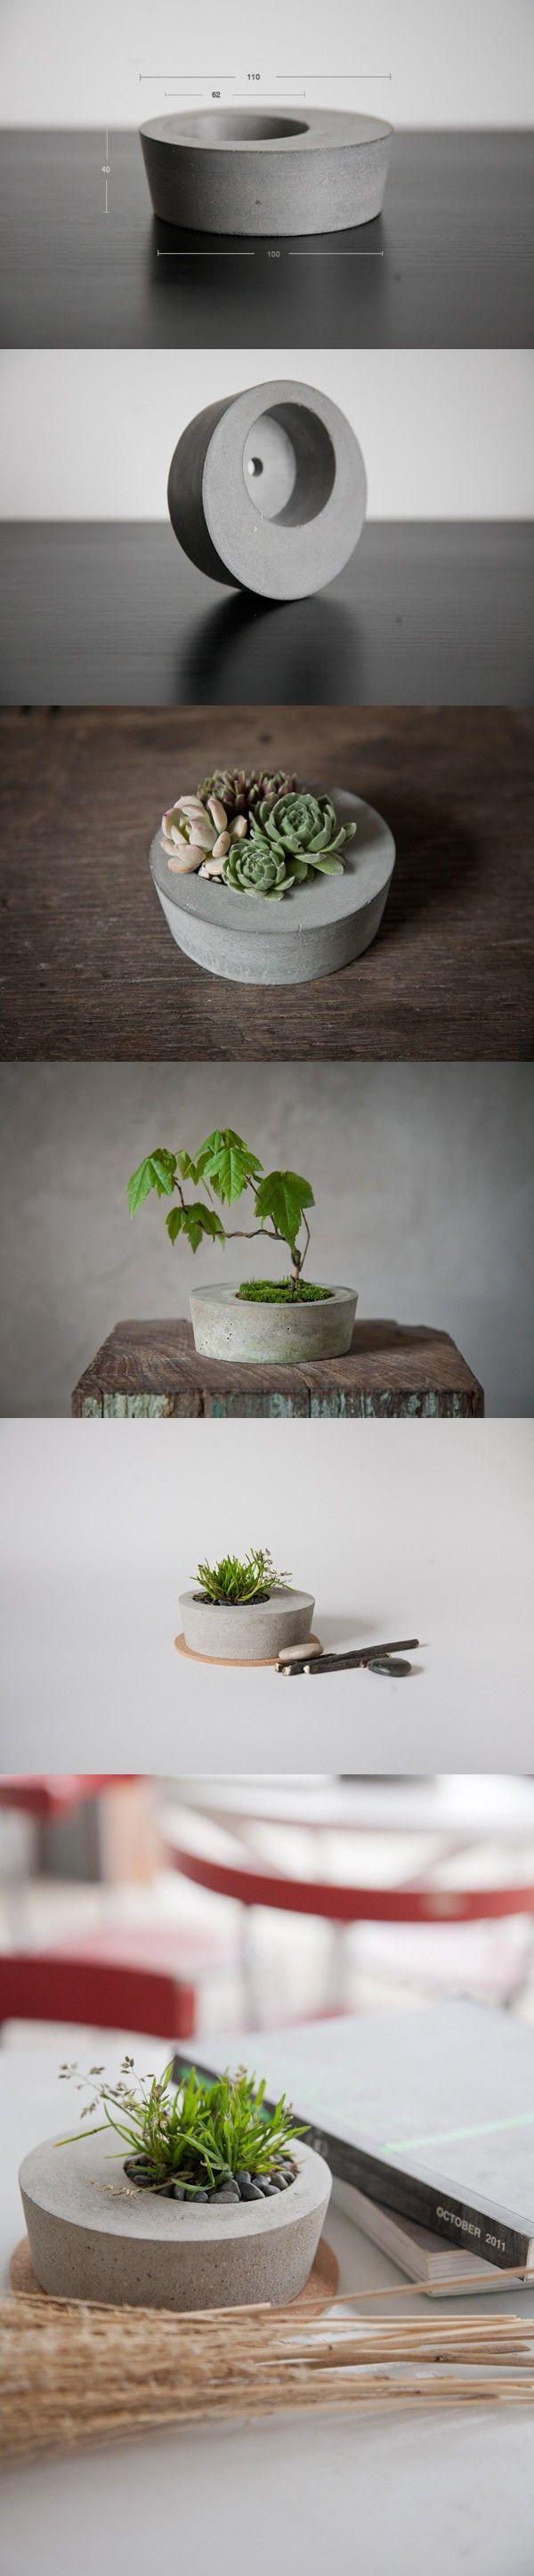 Joli pot à plante en béton |  DIY: Concrete planter #planter #concrete #DIY //admired by http://www.truelatvia.com